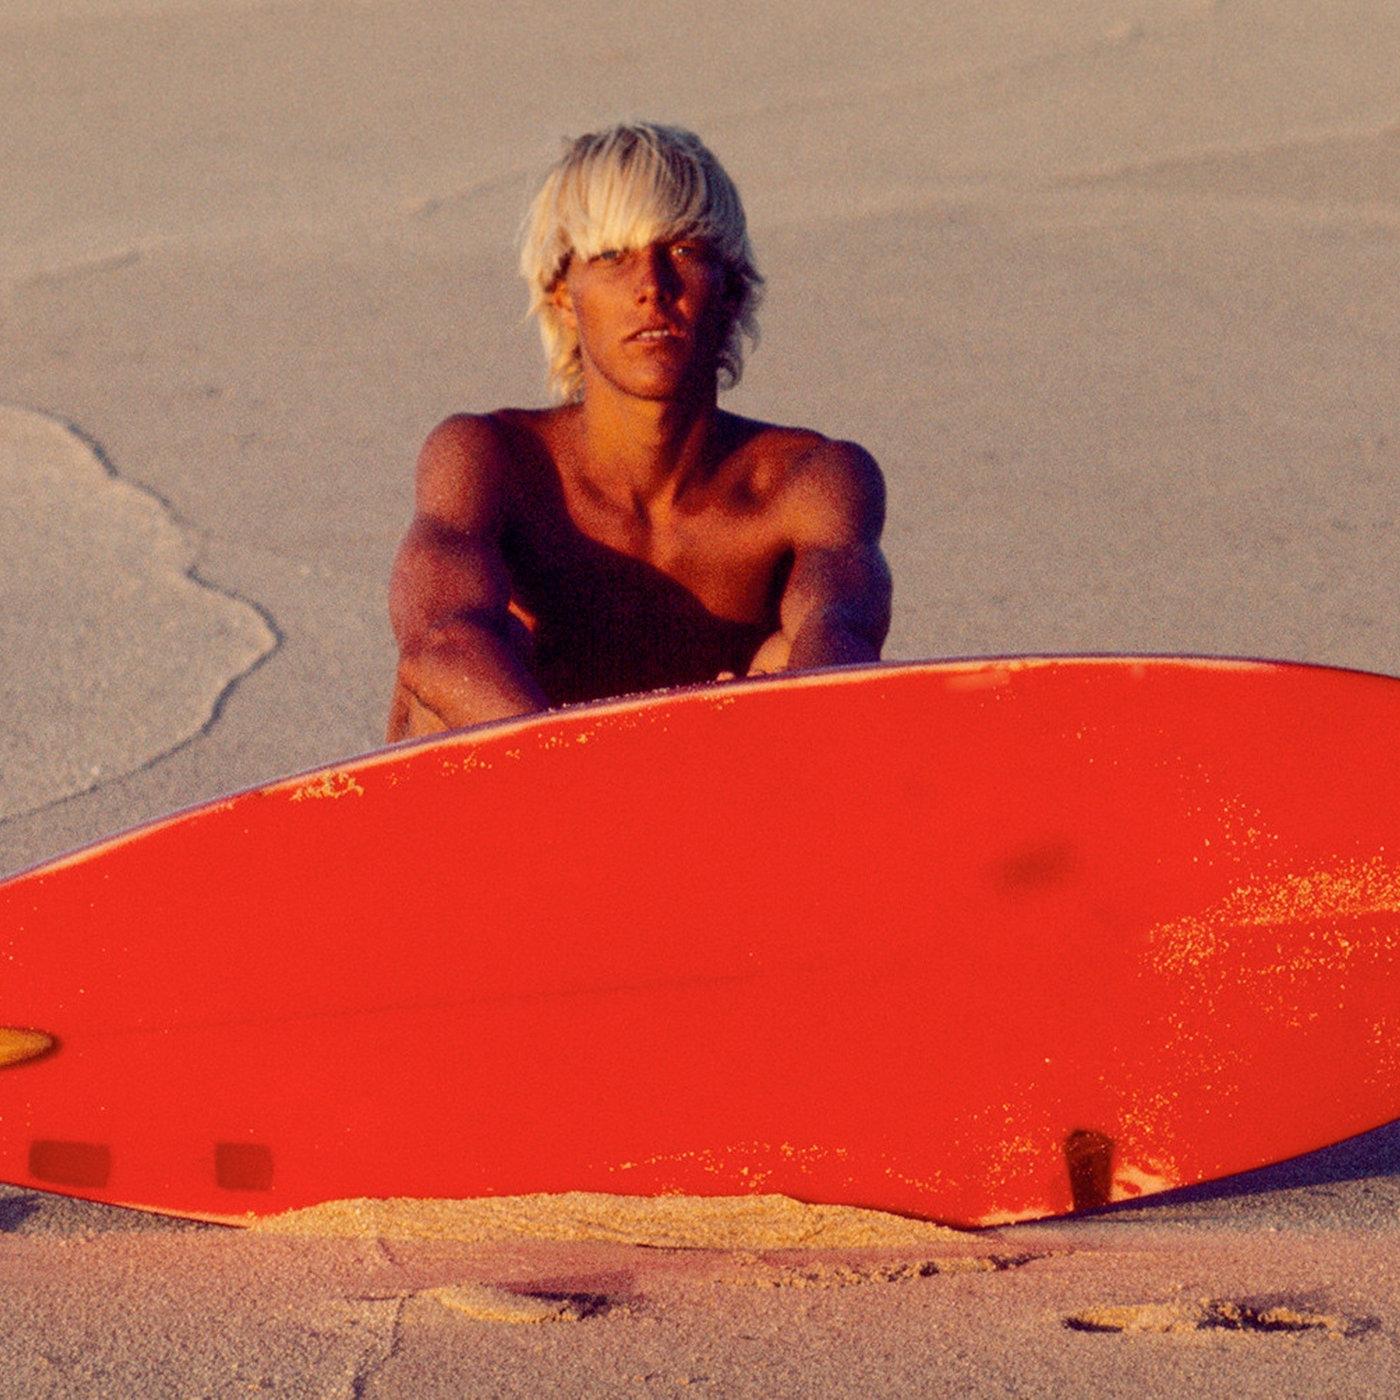 Bunker - Das wilde Leben des Surf-Pioniers Bunker Spreckels